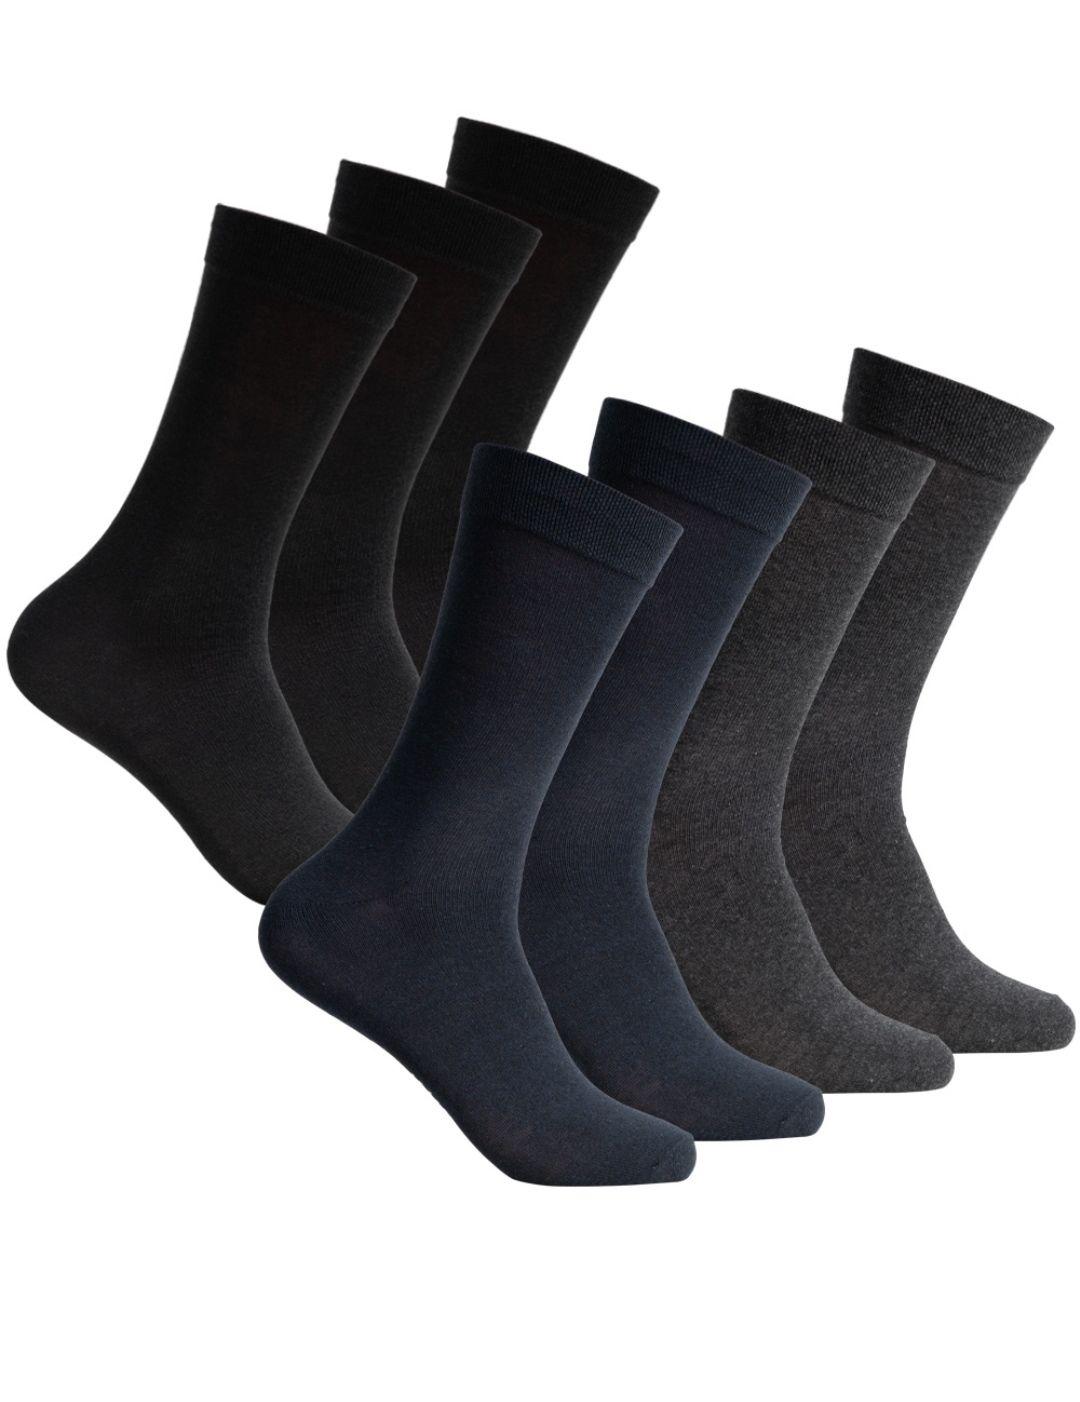 SportSpar Hombre Calcetines clásicos 7 pares